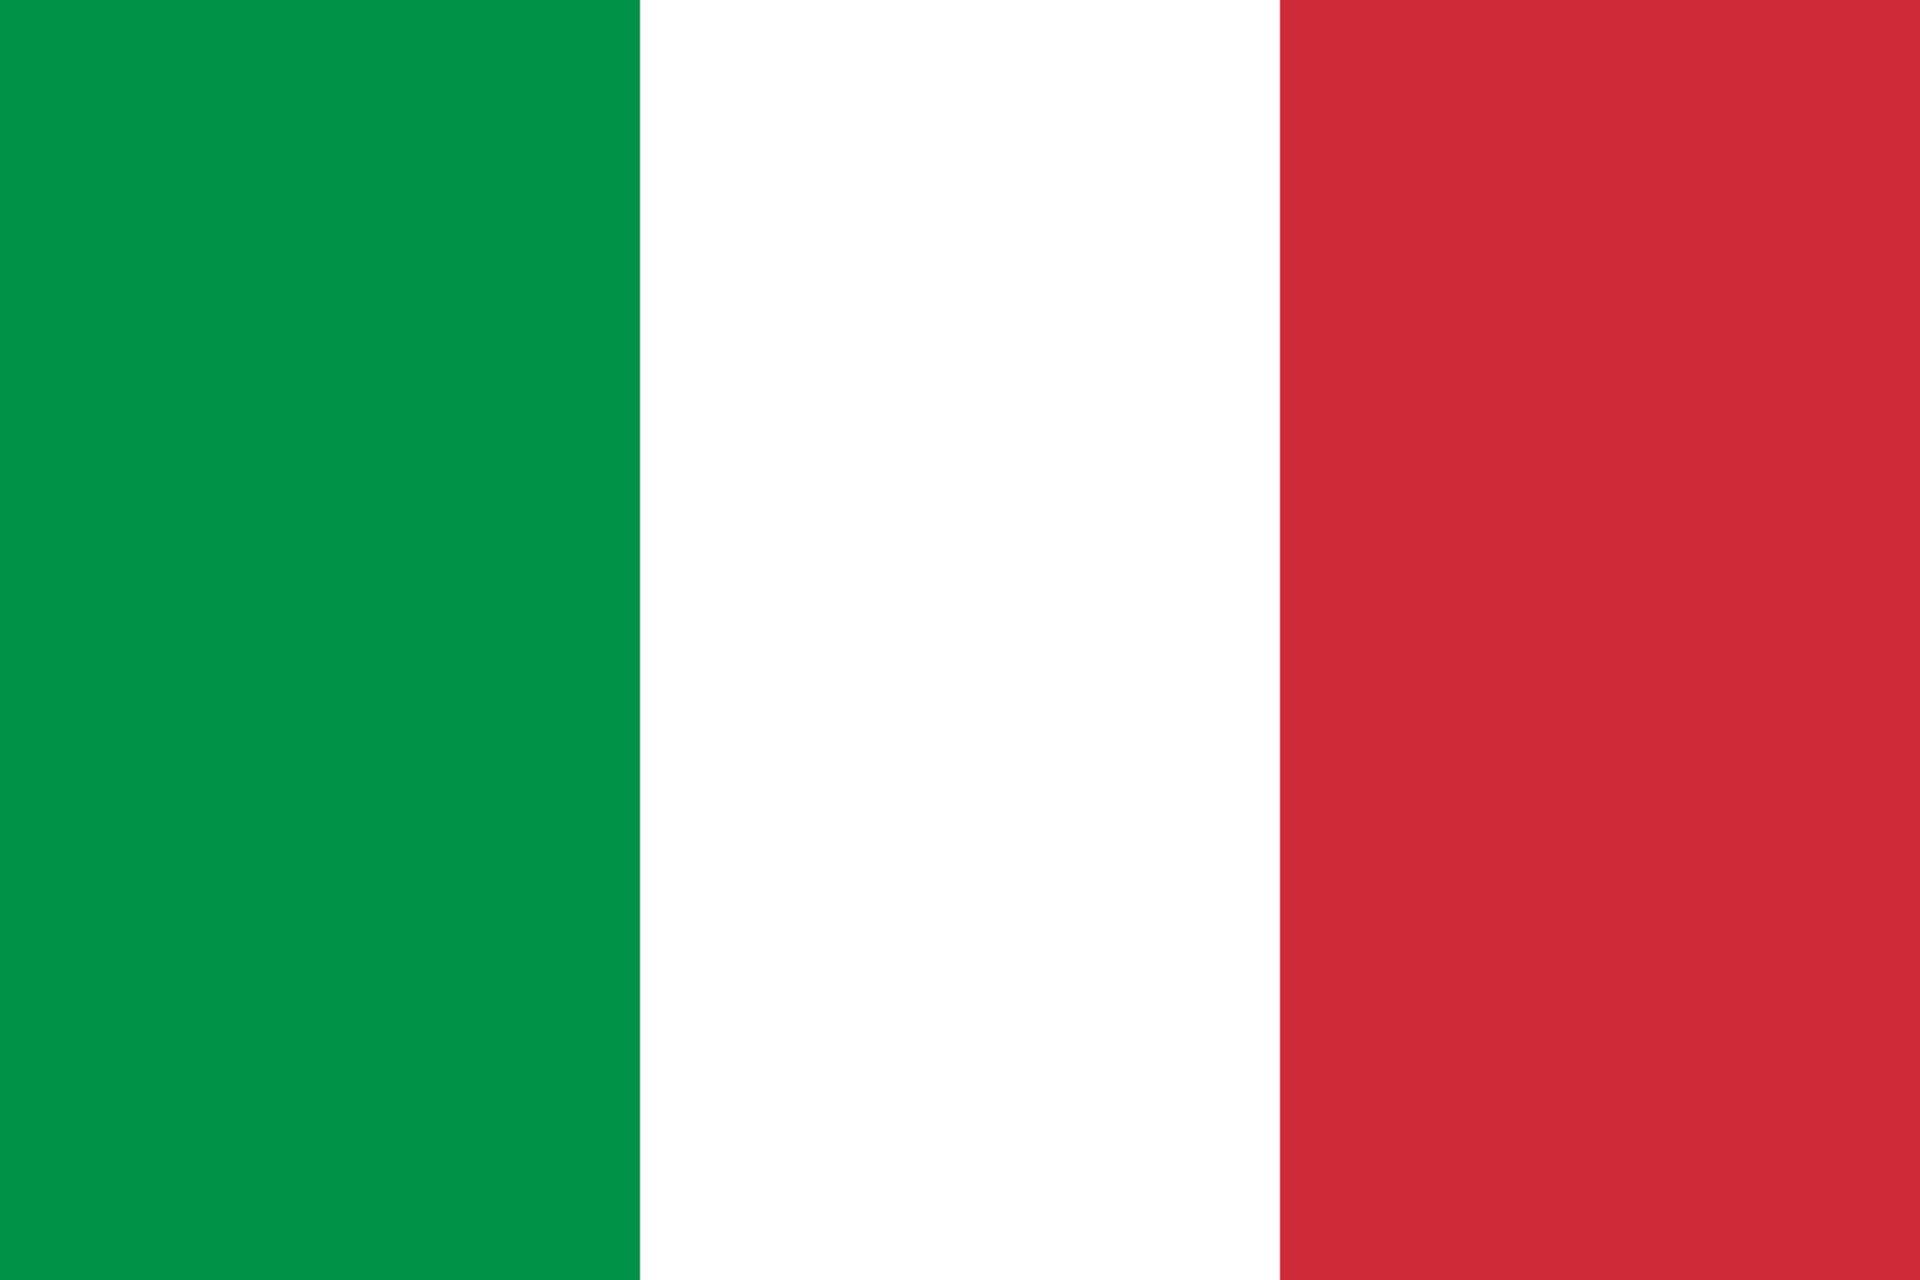 italy-flag-large